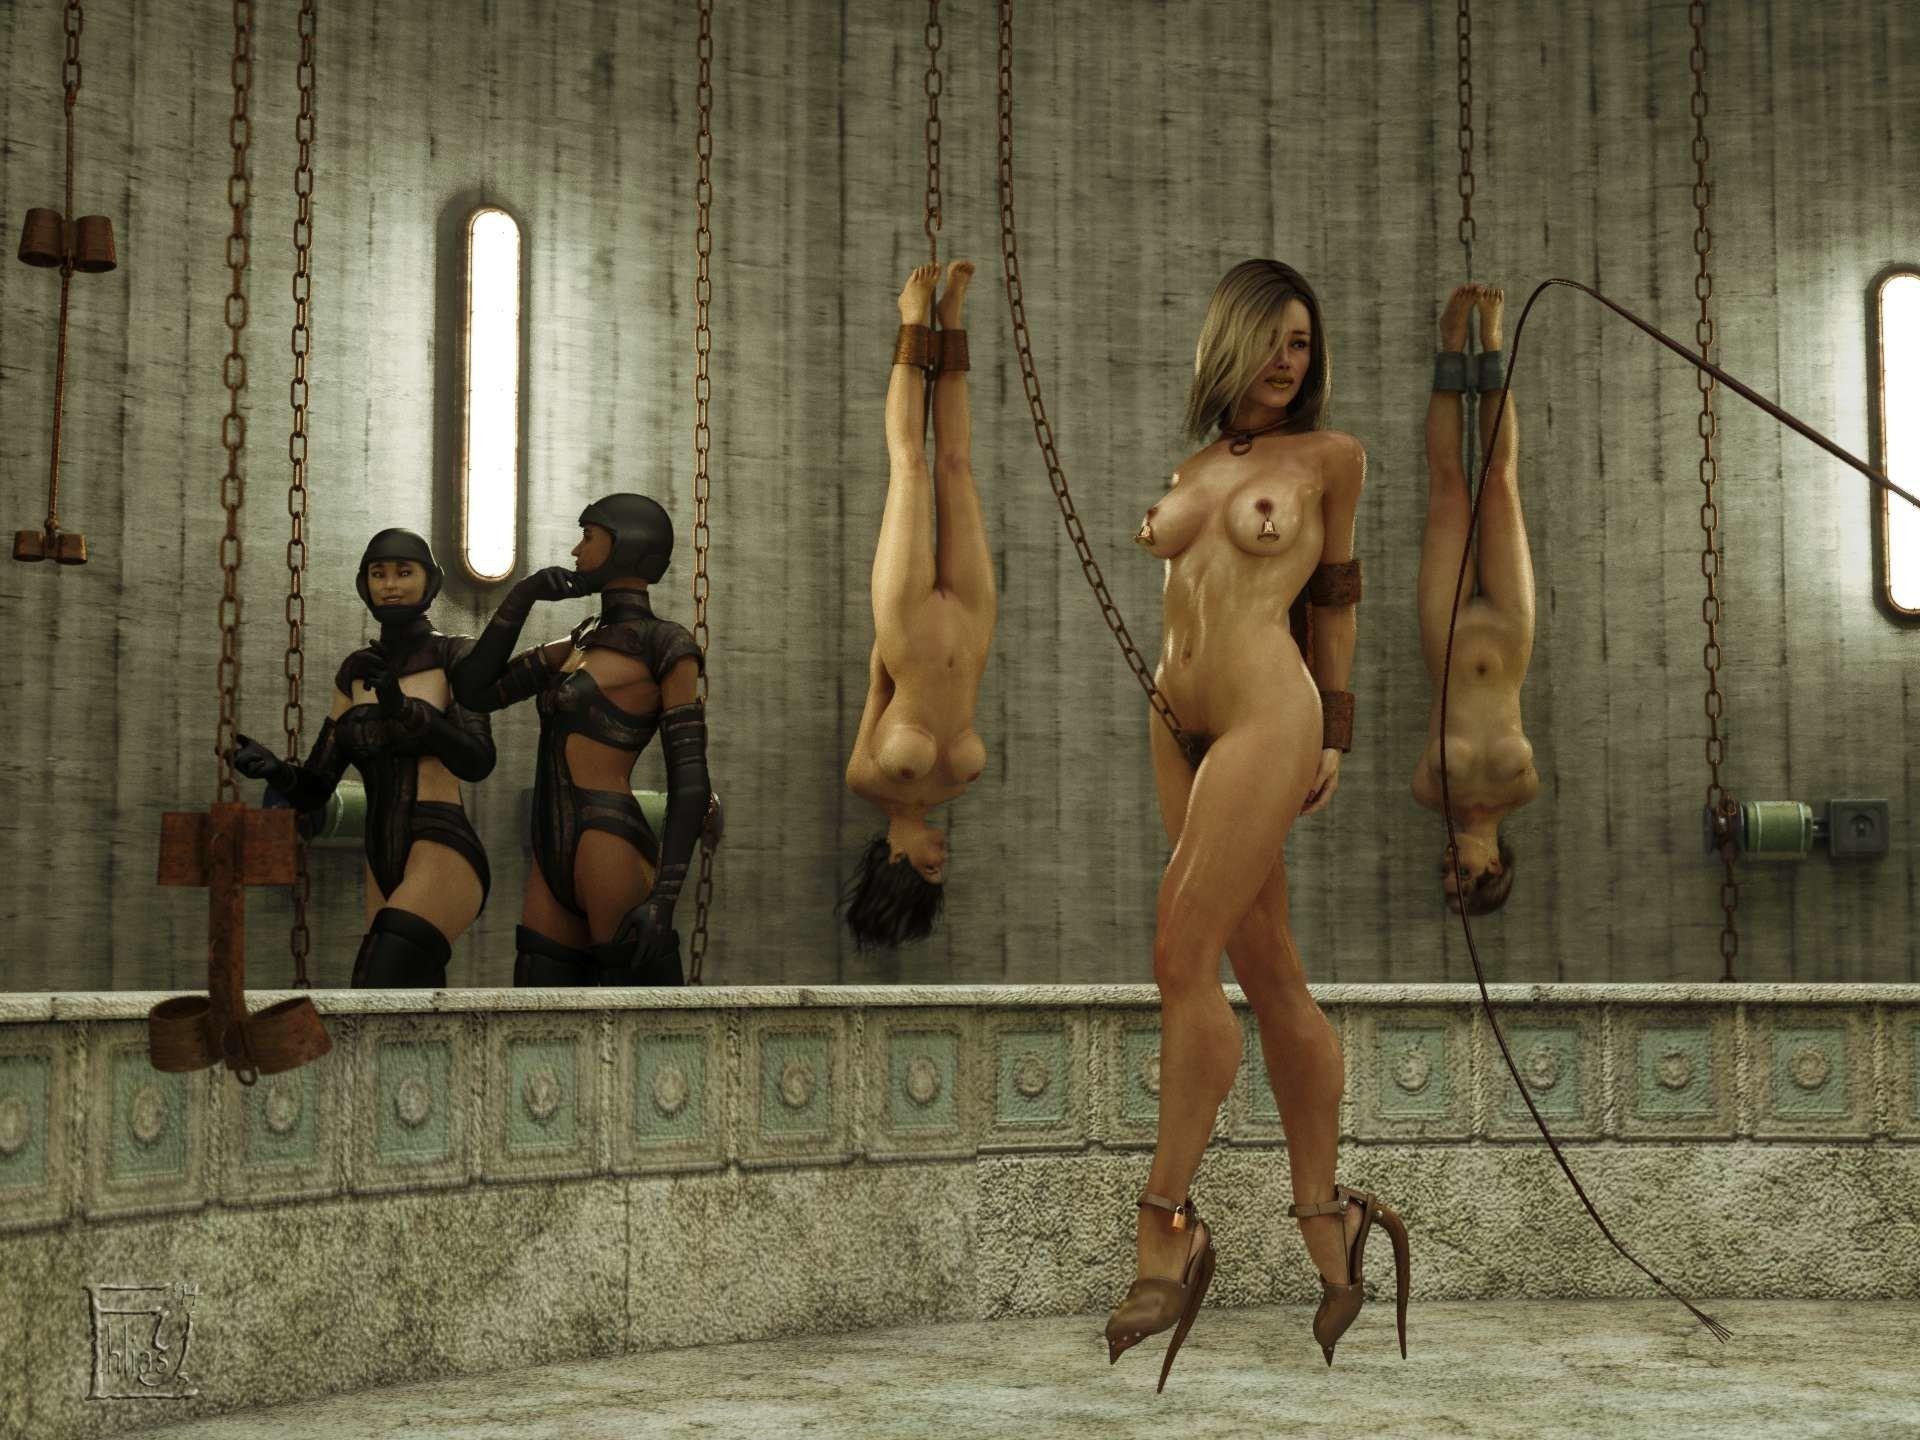 sex-strip-girl-slave-gallery-walsh-nude-photo